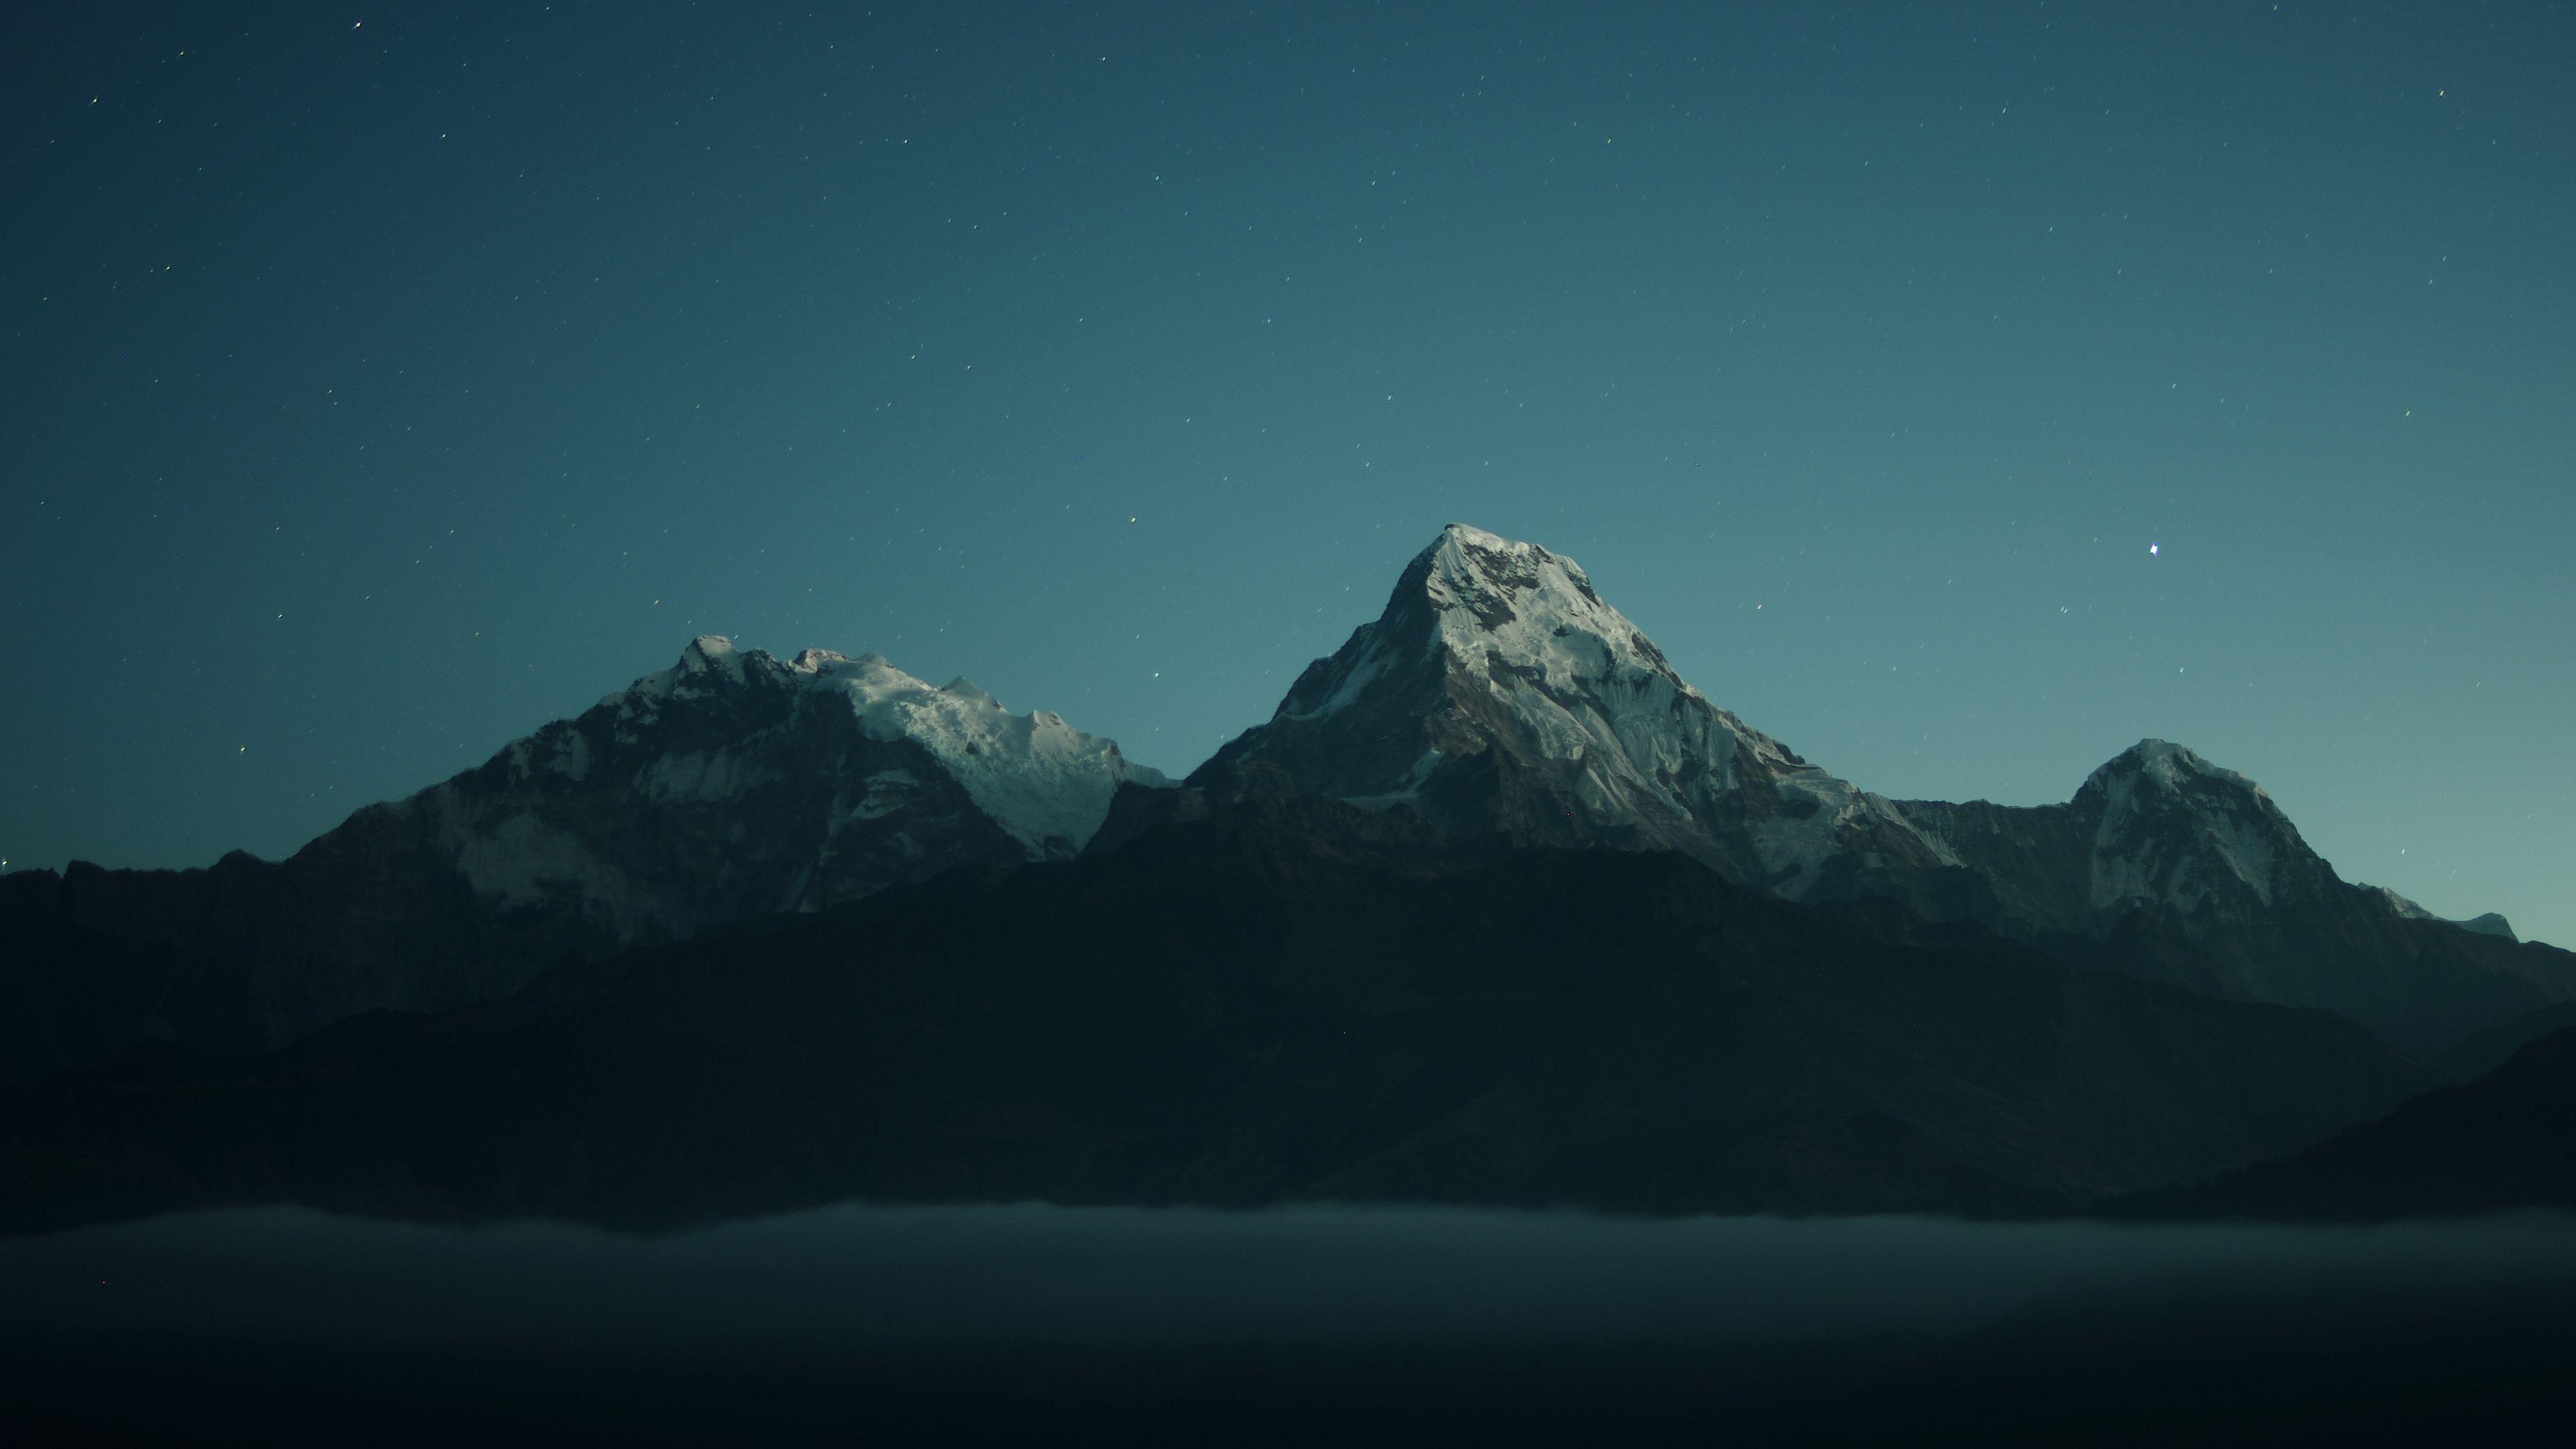 Wallpaper 4k Mountains Landscape Dark Nature 4k 4k